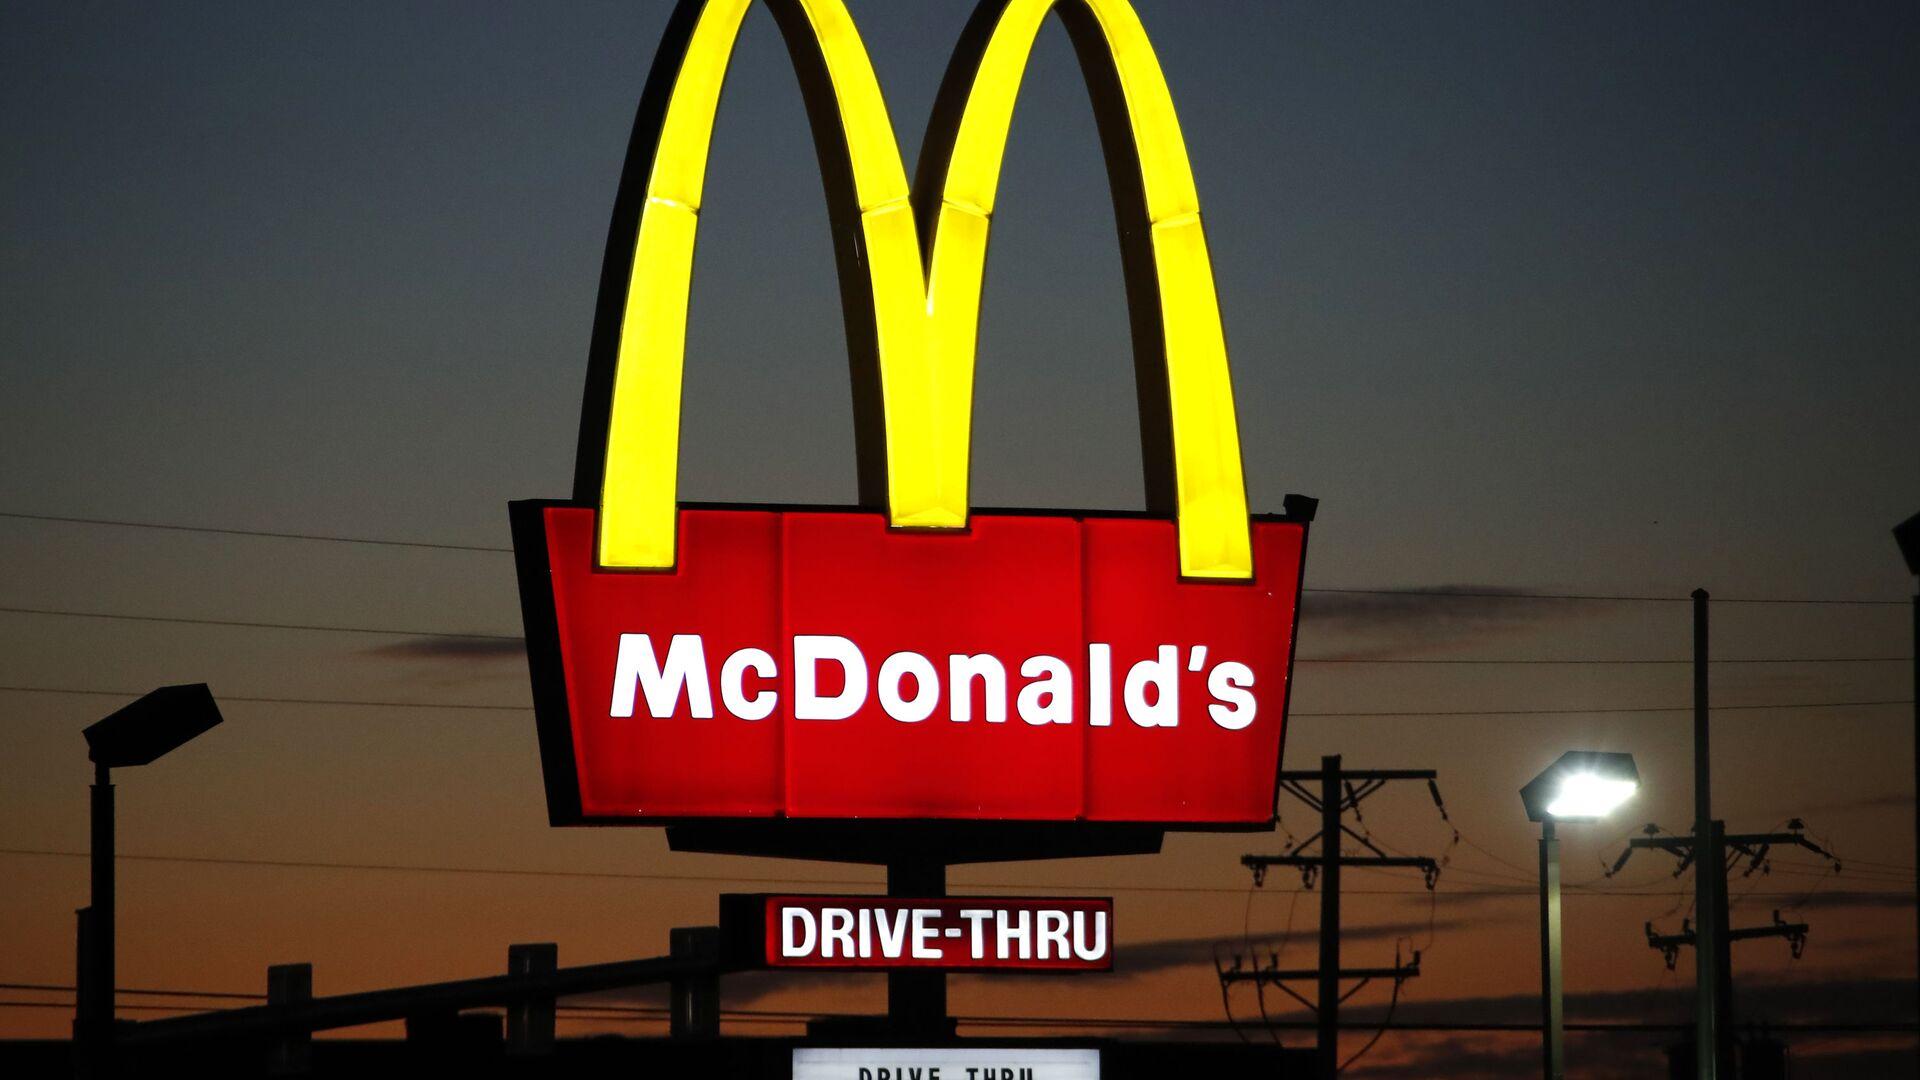 Logo de la cadena de restaurantes de comida rápida McDonald's - Sputnik Mundo, 1920, 24.08.2021